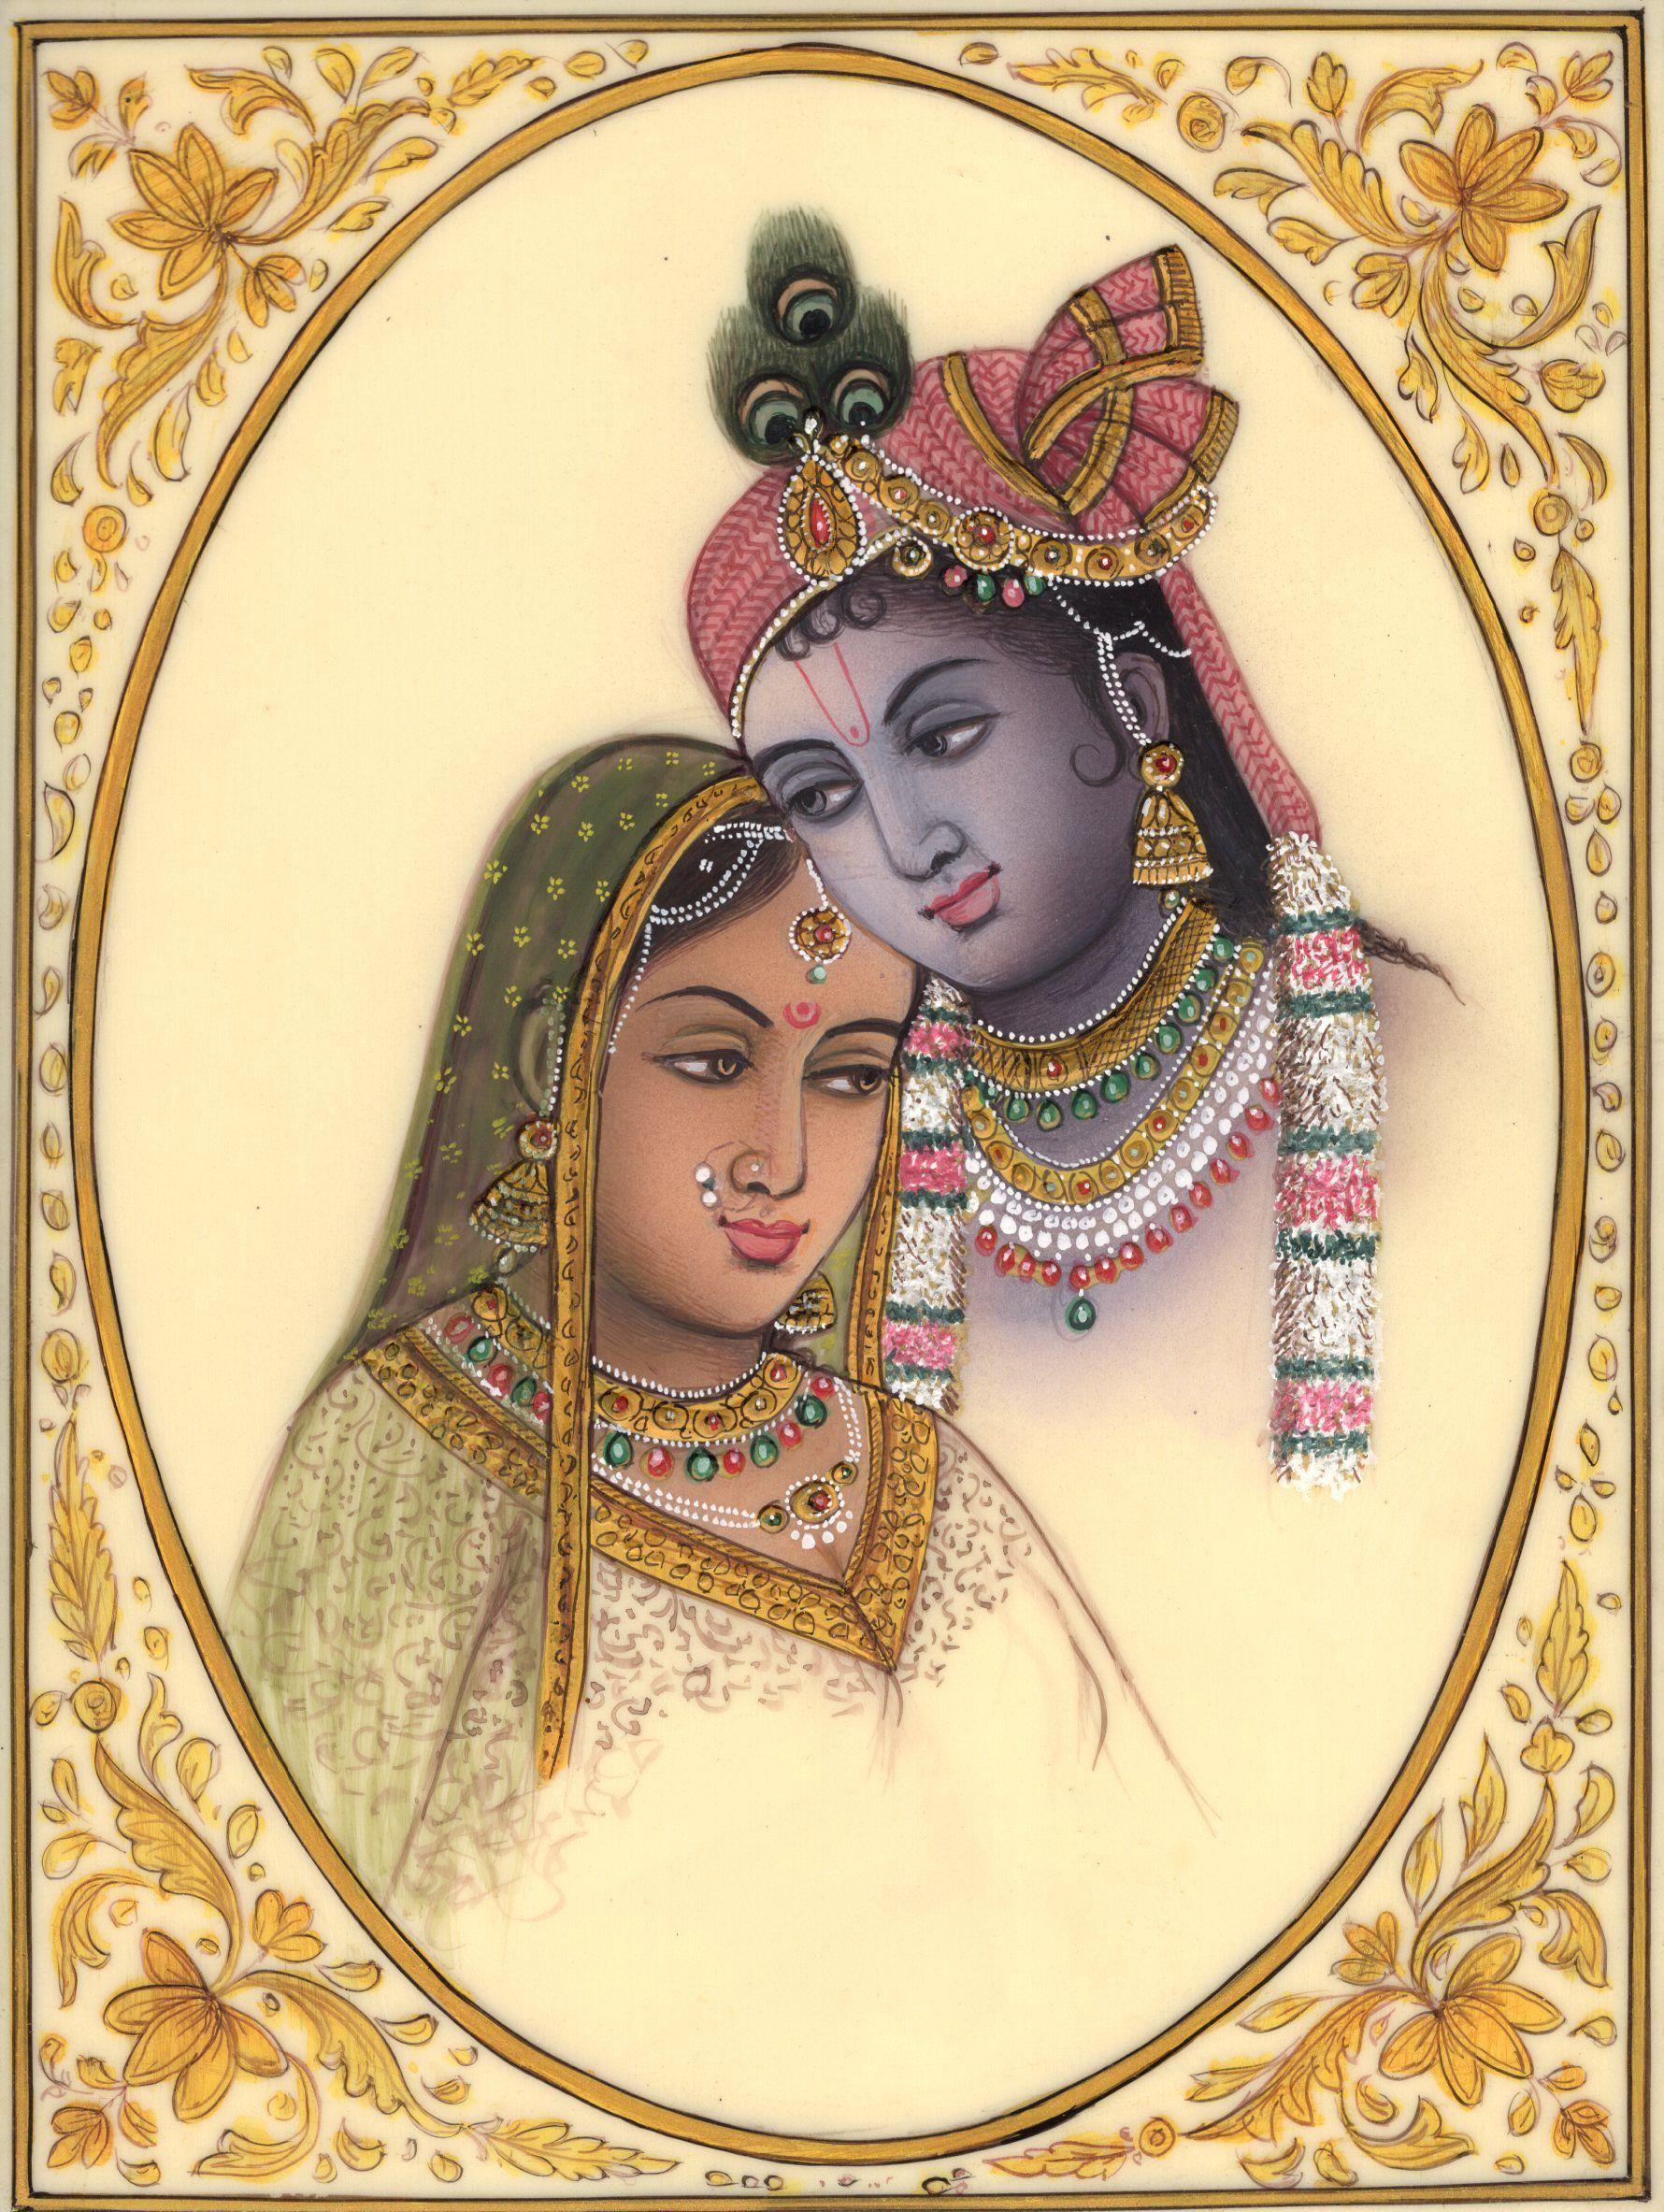 Radha Krishna Indian Hindu Painting Handmade Miniature Folk Home ...